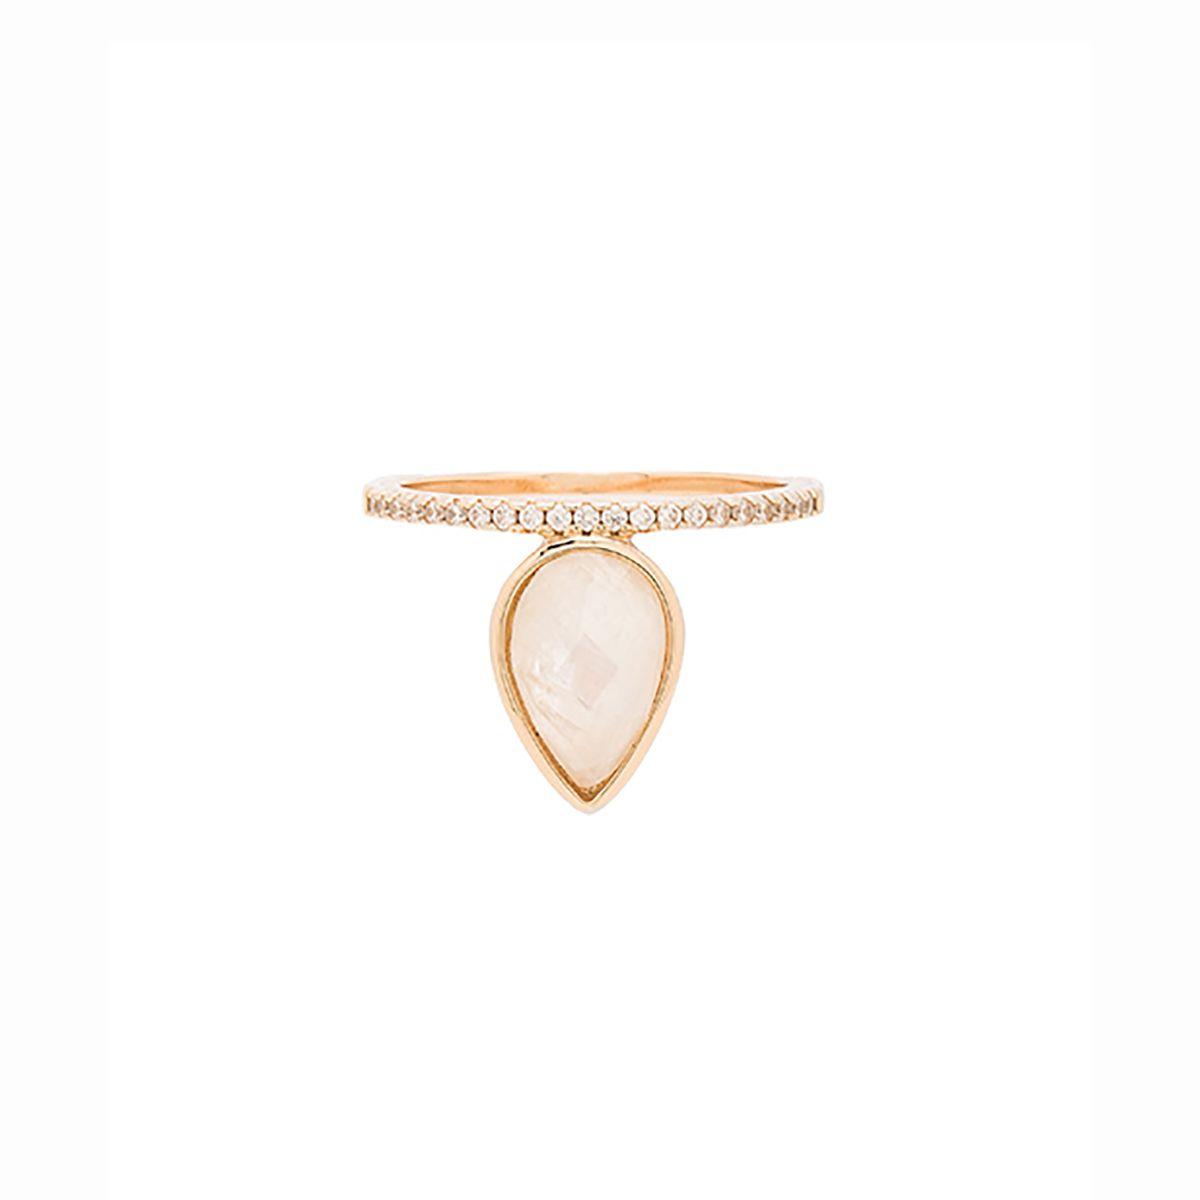 Moonstone Teardrop Ring